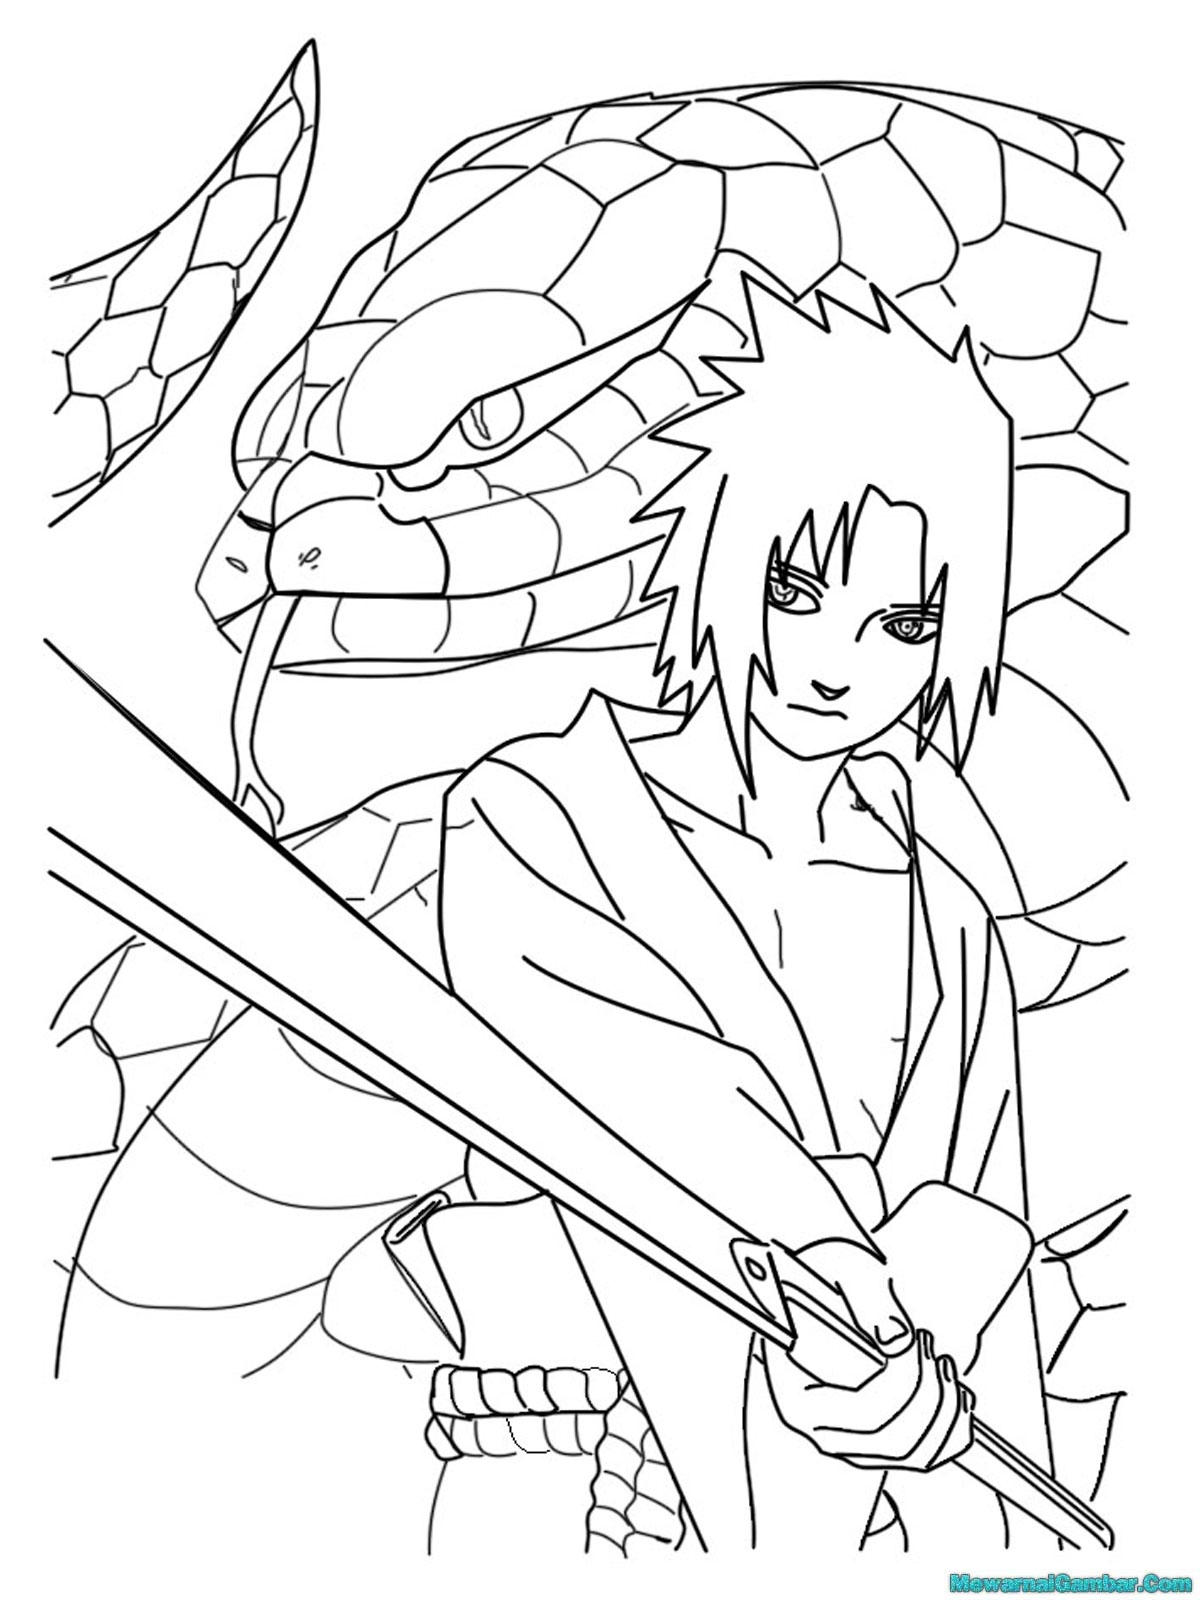 88 Gambar Hitam Putih Naruto Gratis